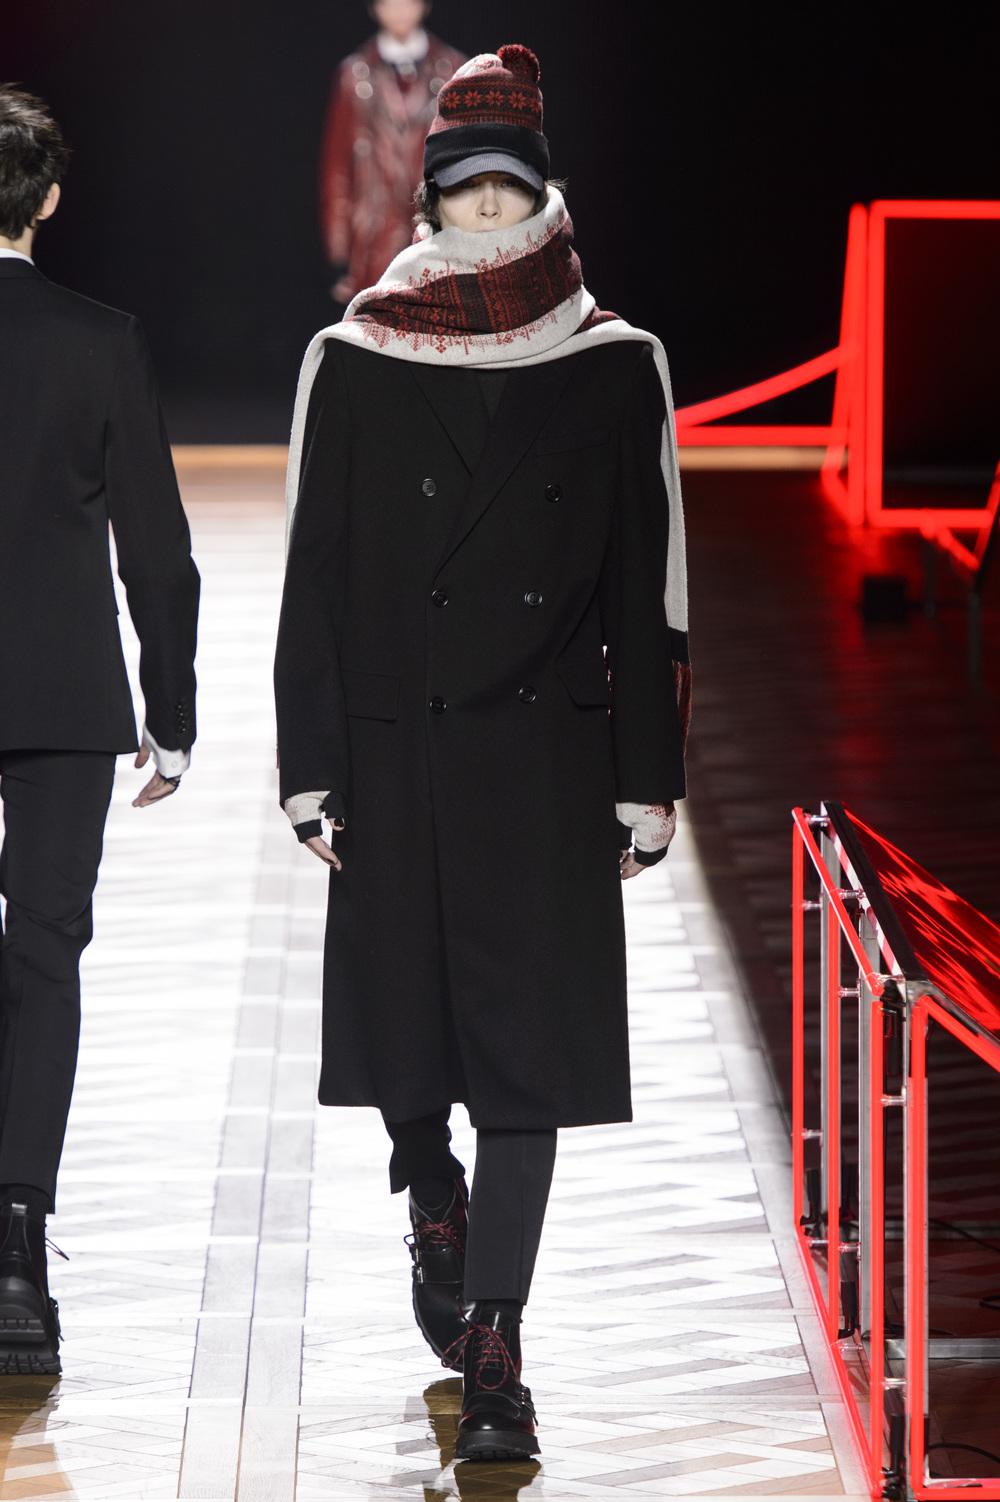 Dior_Homme_Hiver2016-17_look_06.JPG